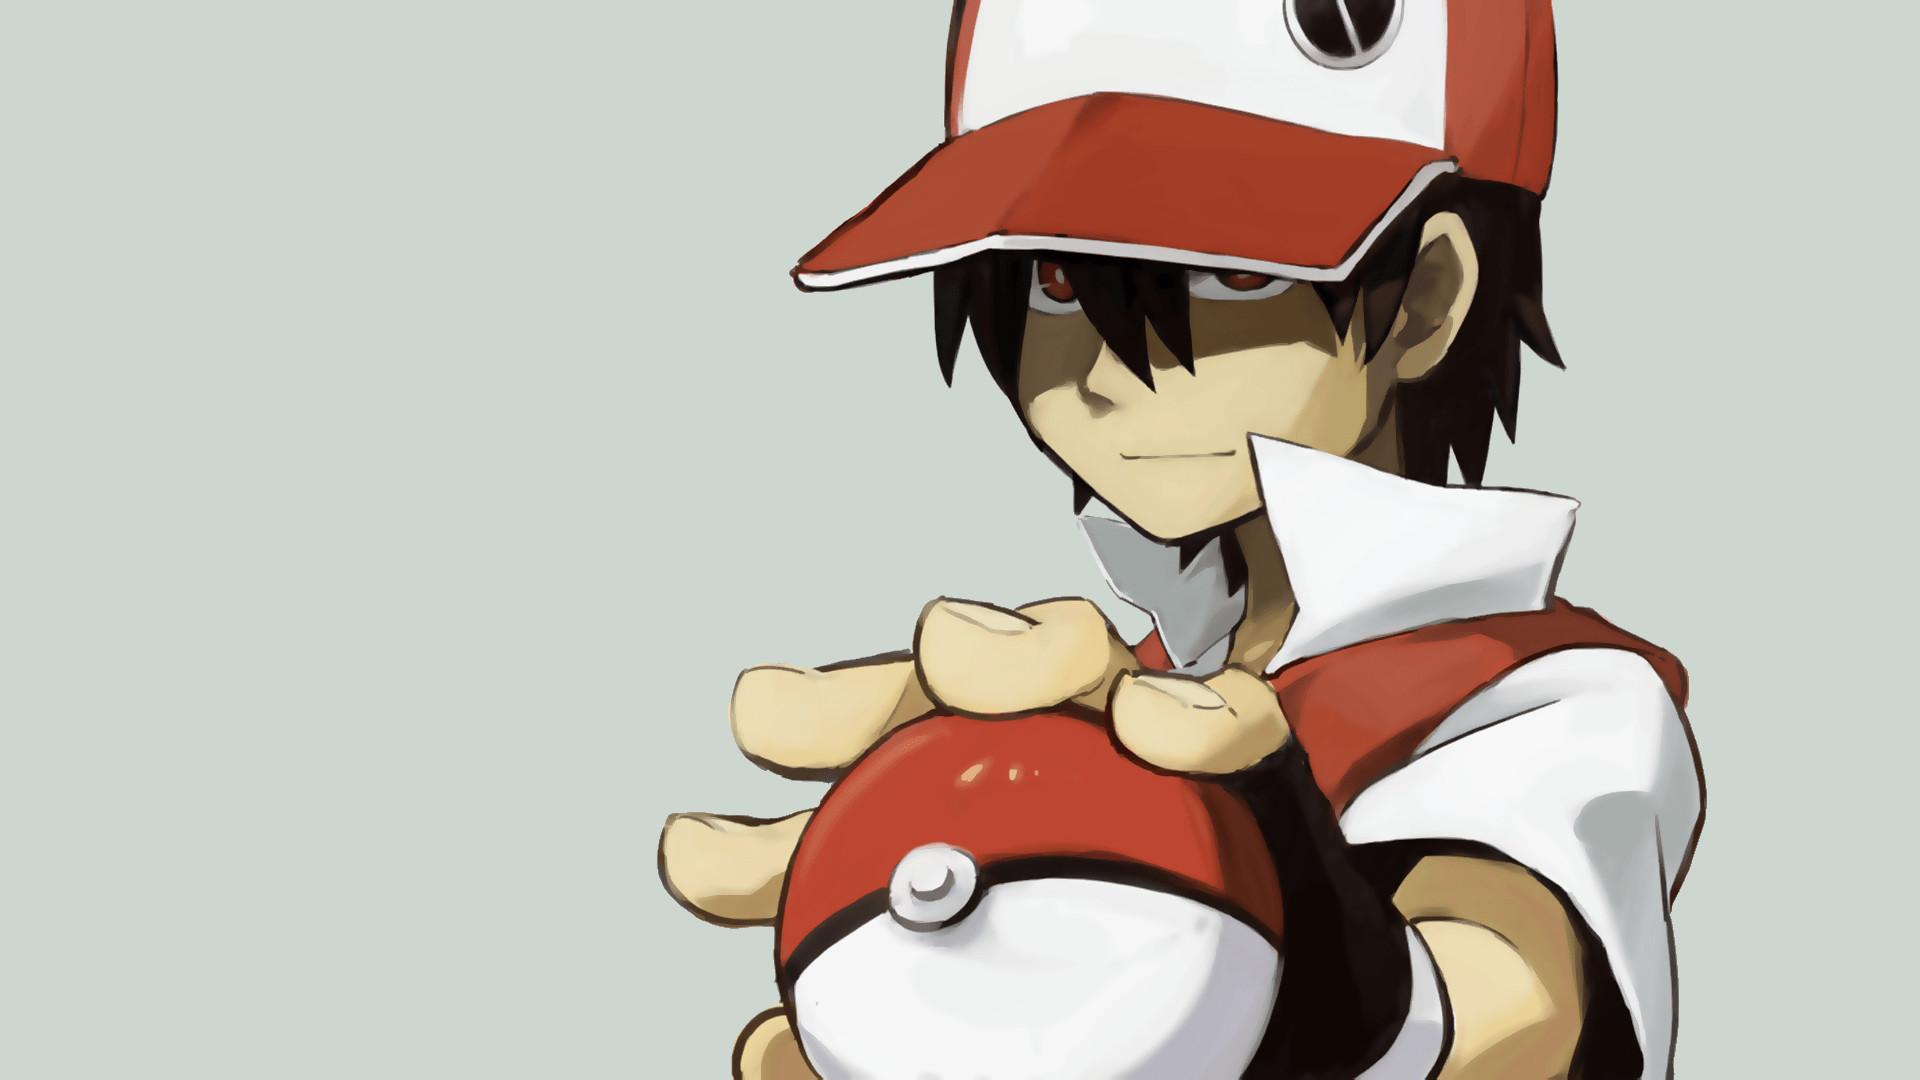 Pokemon Red Wallpaper 57867 Wallpaper | wallpicsize.